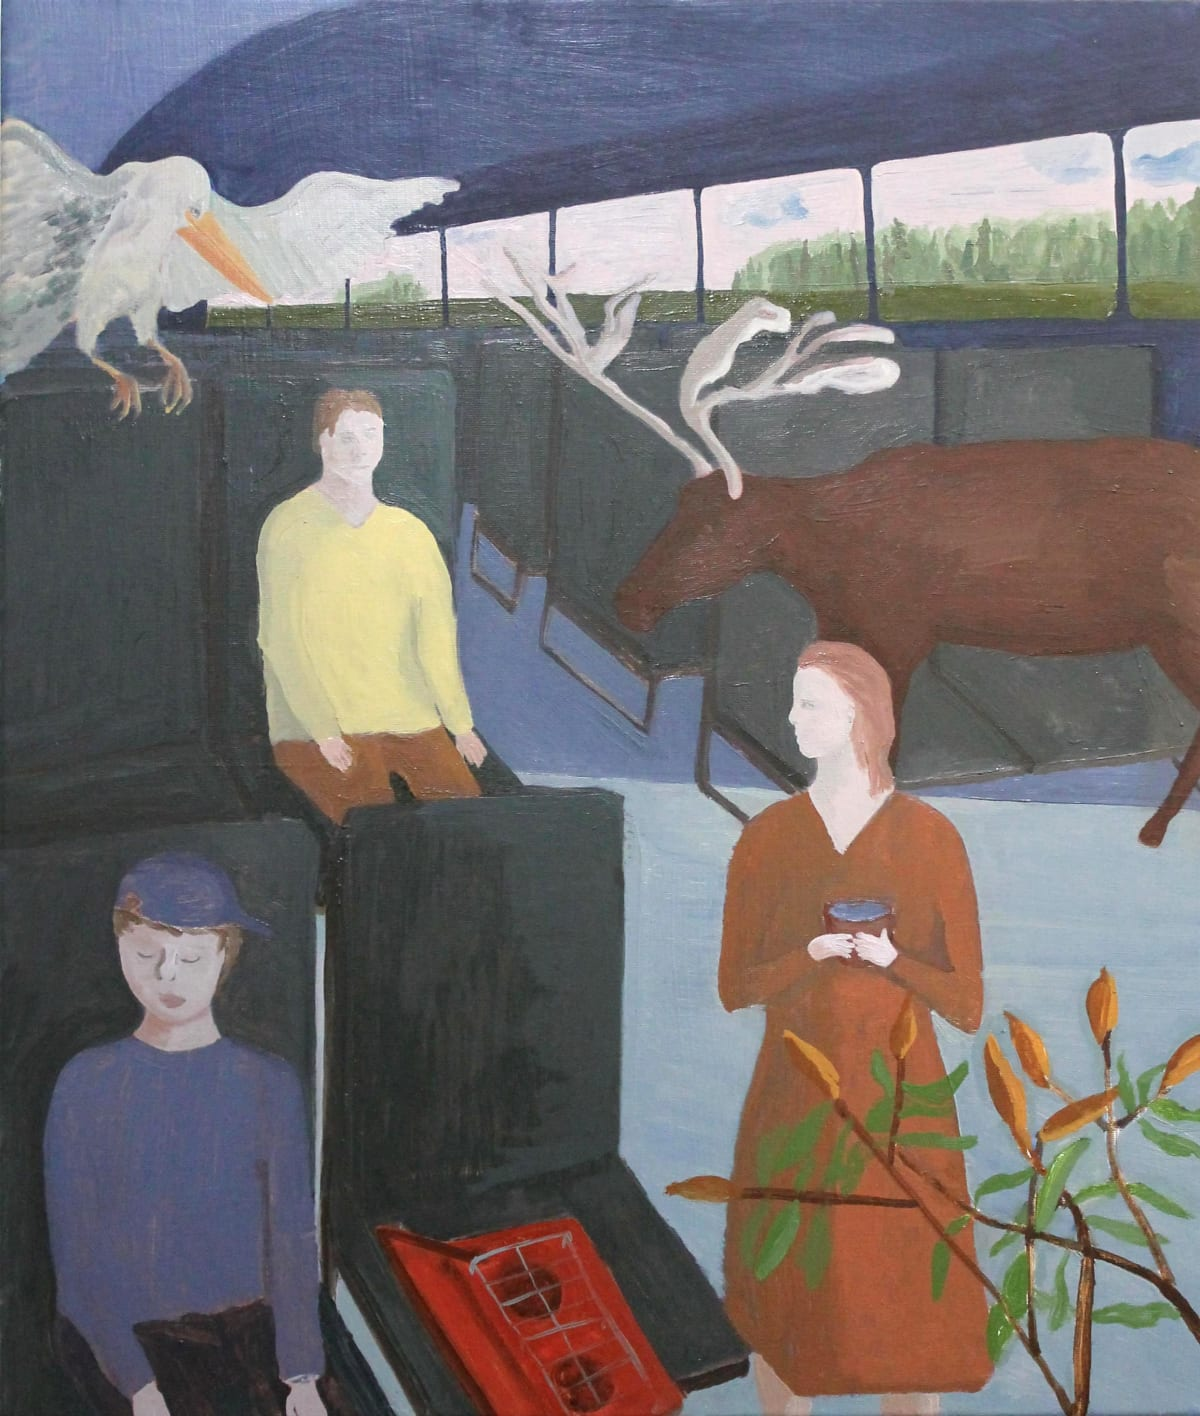 Oscar Fouz Lopez No signal Oil on canvas 70 x 60 cm